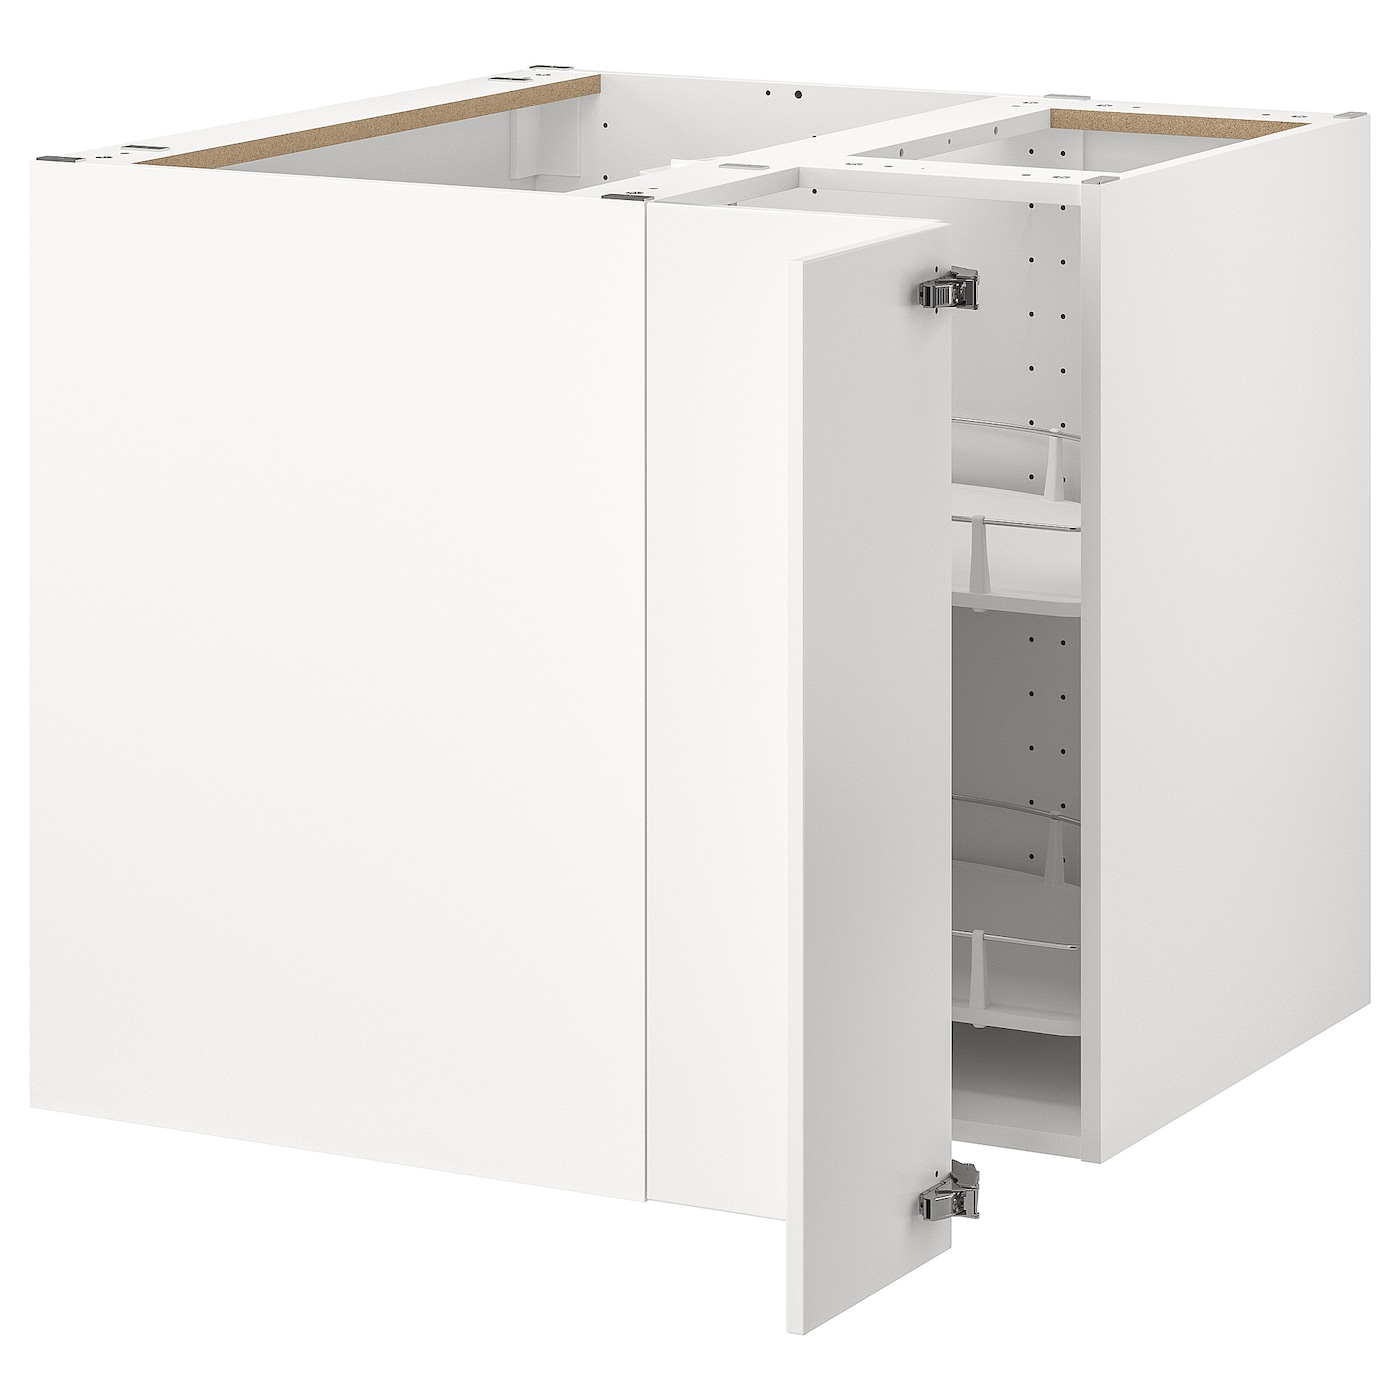 METOD Corner base cabinet with carousel - white/Veddinge white 11x11 cm